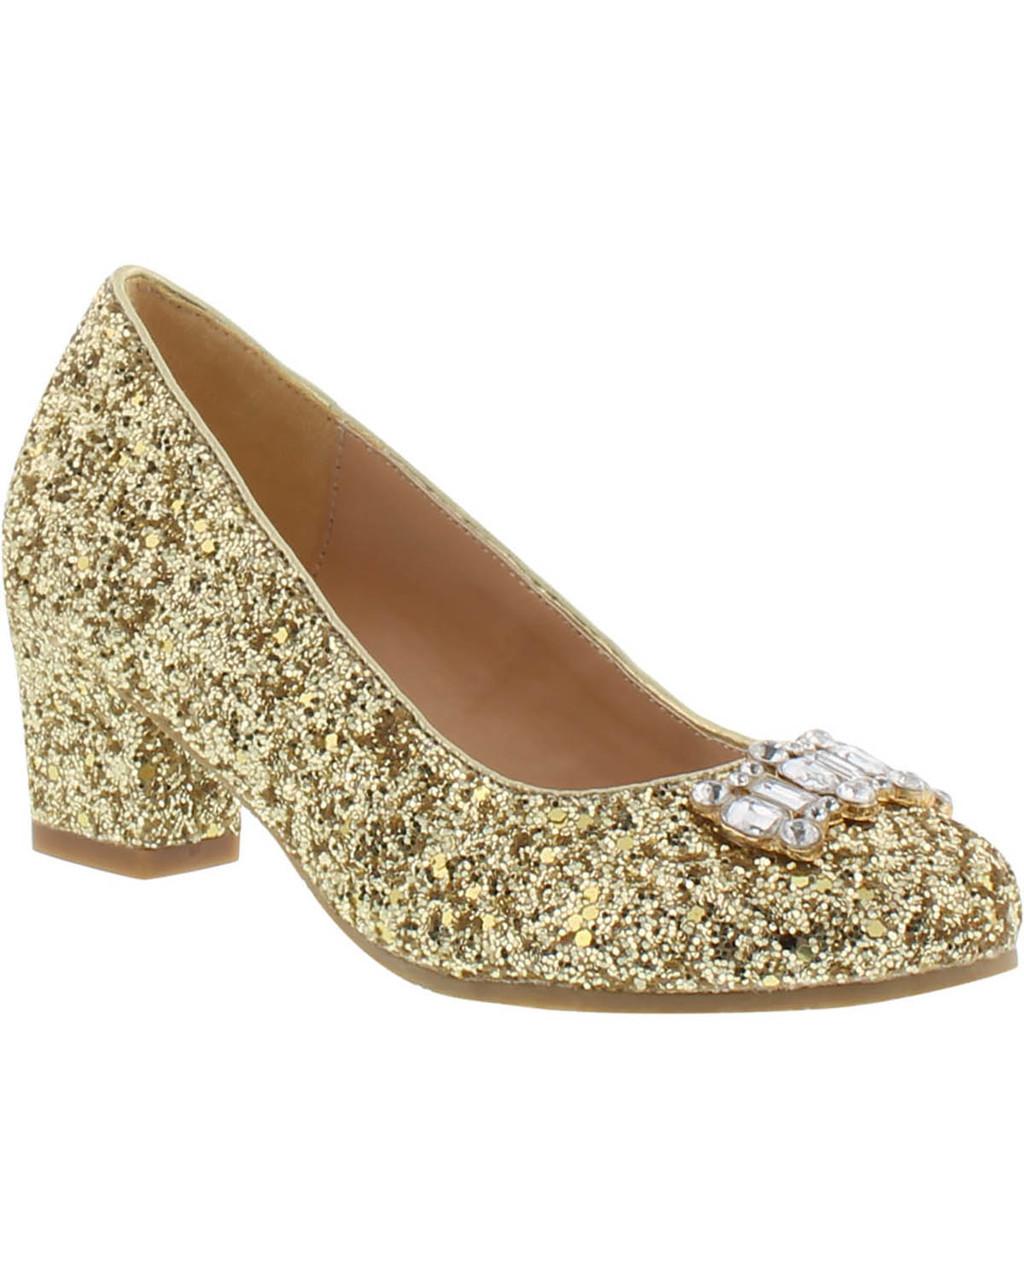 6b80f993c02 Starlett Adorb Girls' Shoe by Badgley Mischka